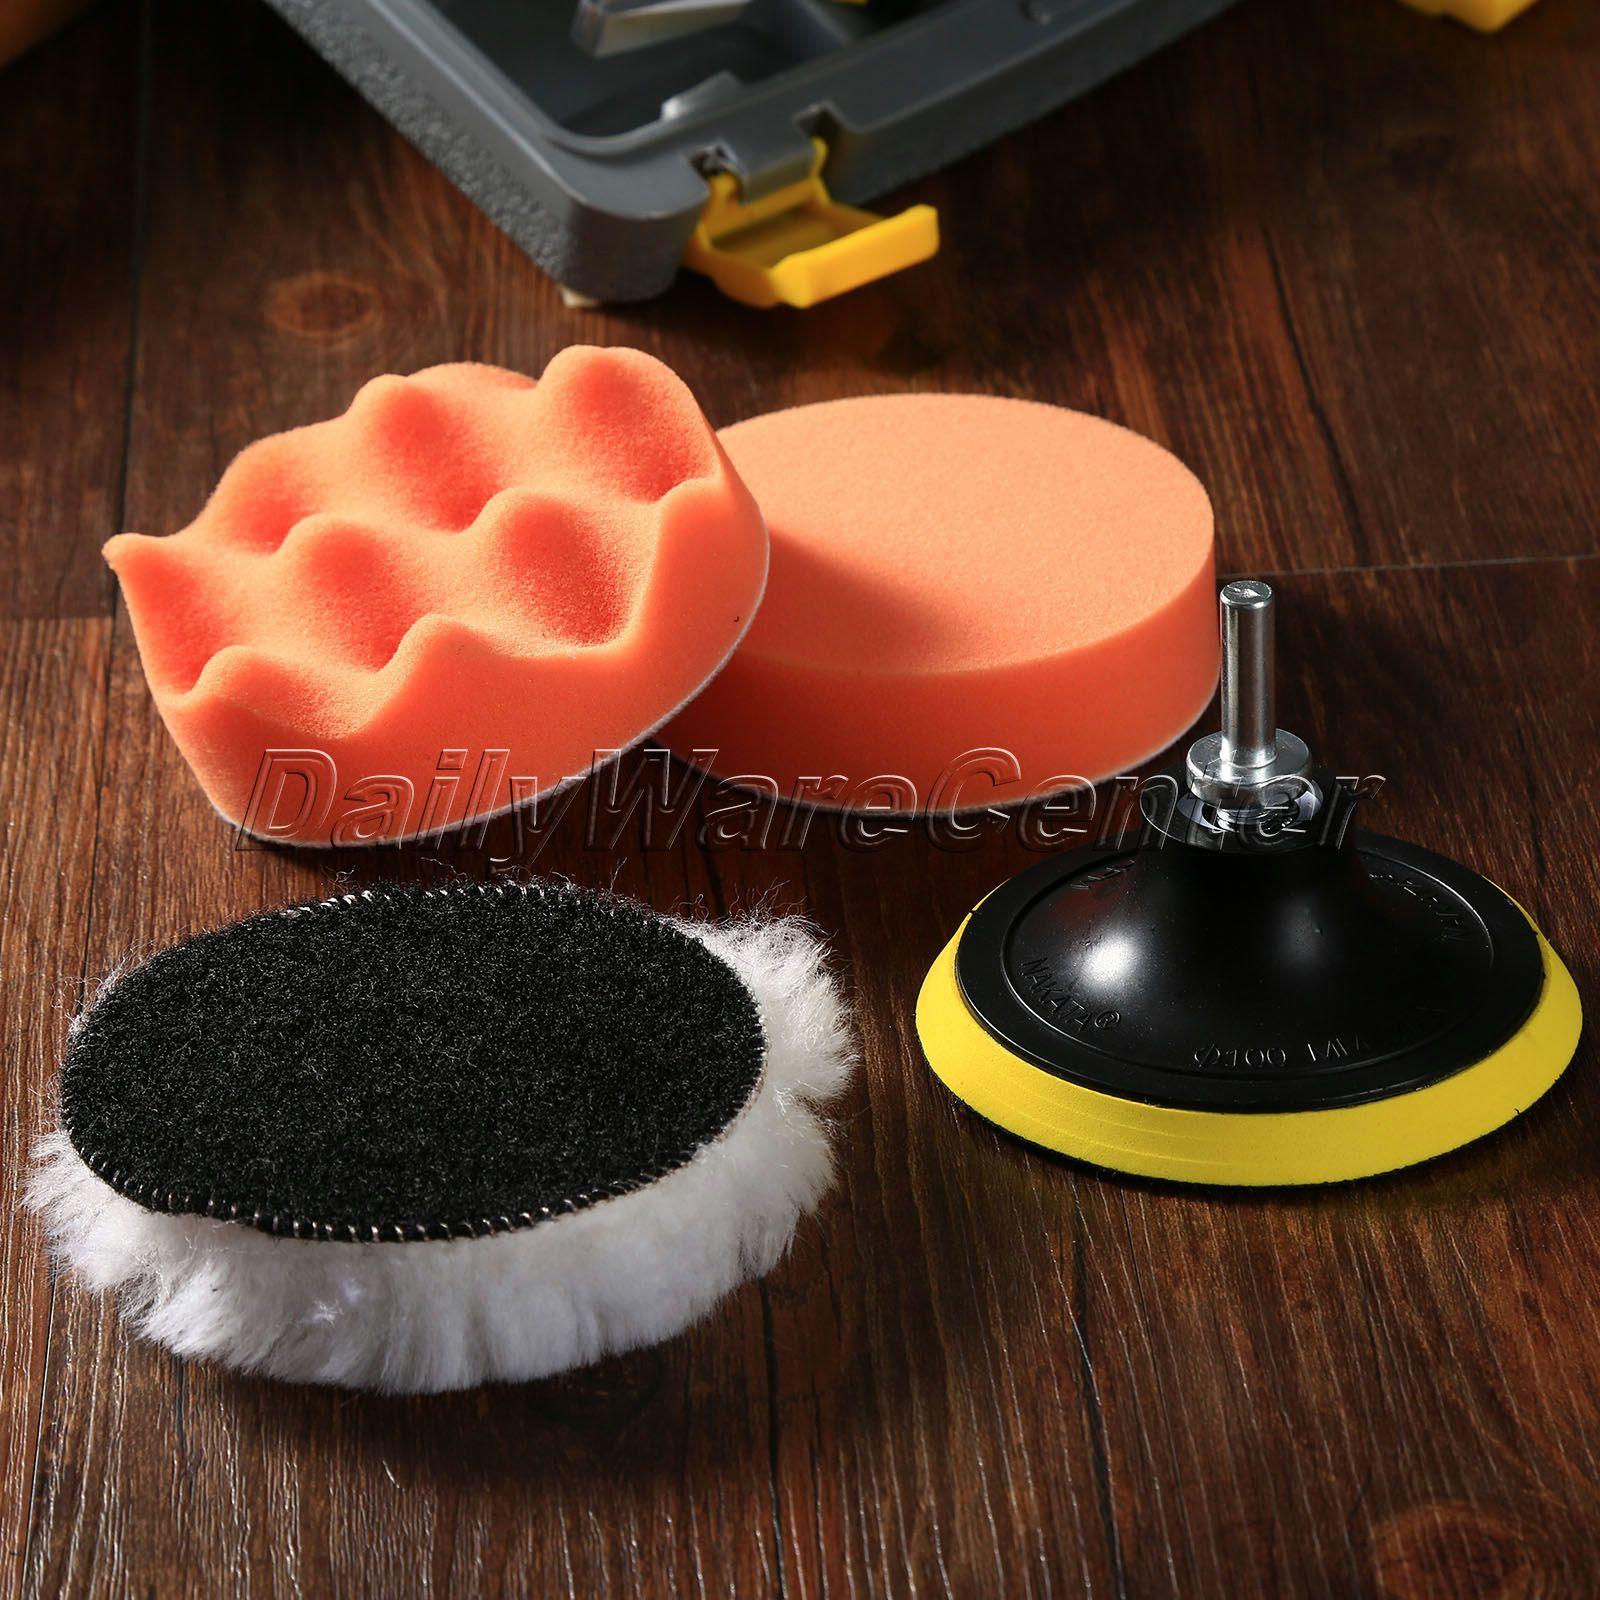 "5Pcs 4"" 100mm Car Wash Auto Car Polishing Sponge Wheel Set Wet Foam Buffing Pads for Car Cleaning W/ Drill Adaptor M10 Car Care(China (Mainland))"